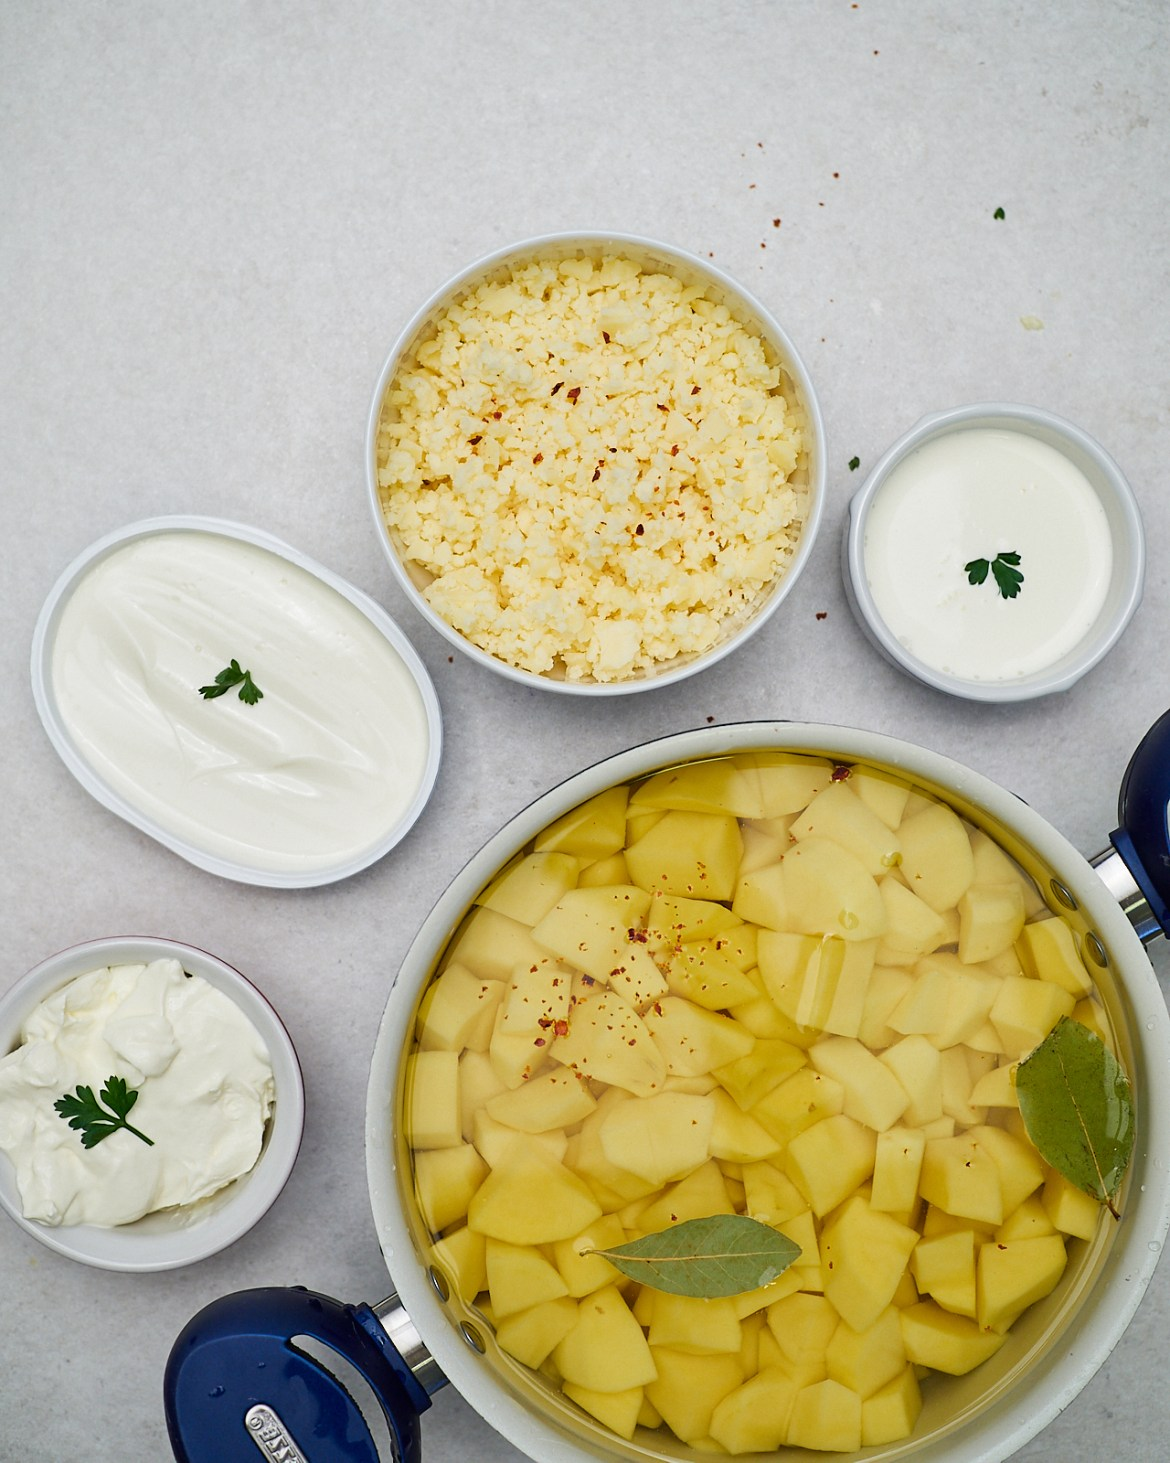 potato casserole ingredients